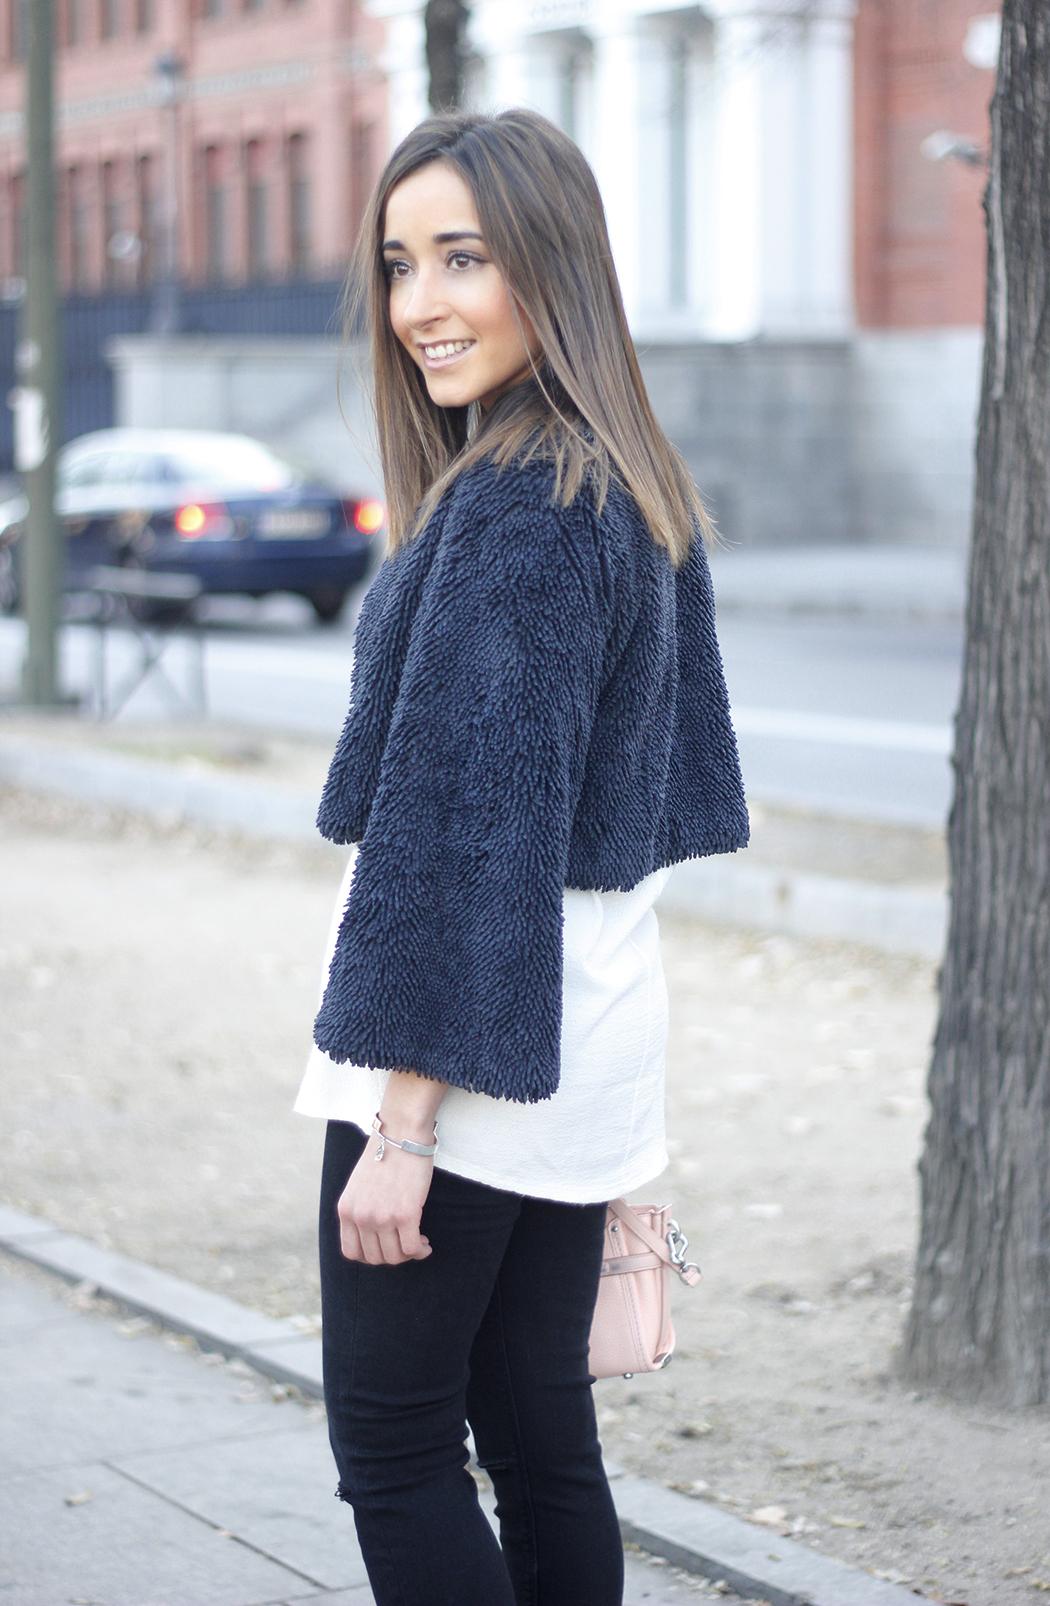 black jeans, coach bag, outfit, style, heels, white t-shirt, Fur Effect Jacket, uterqüe15